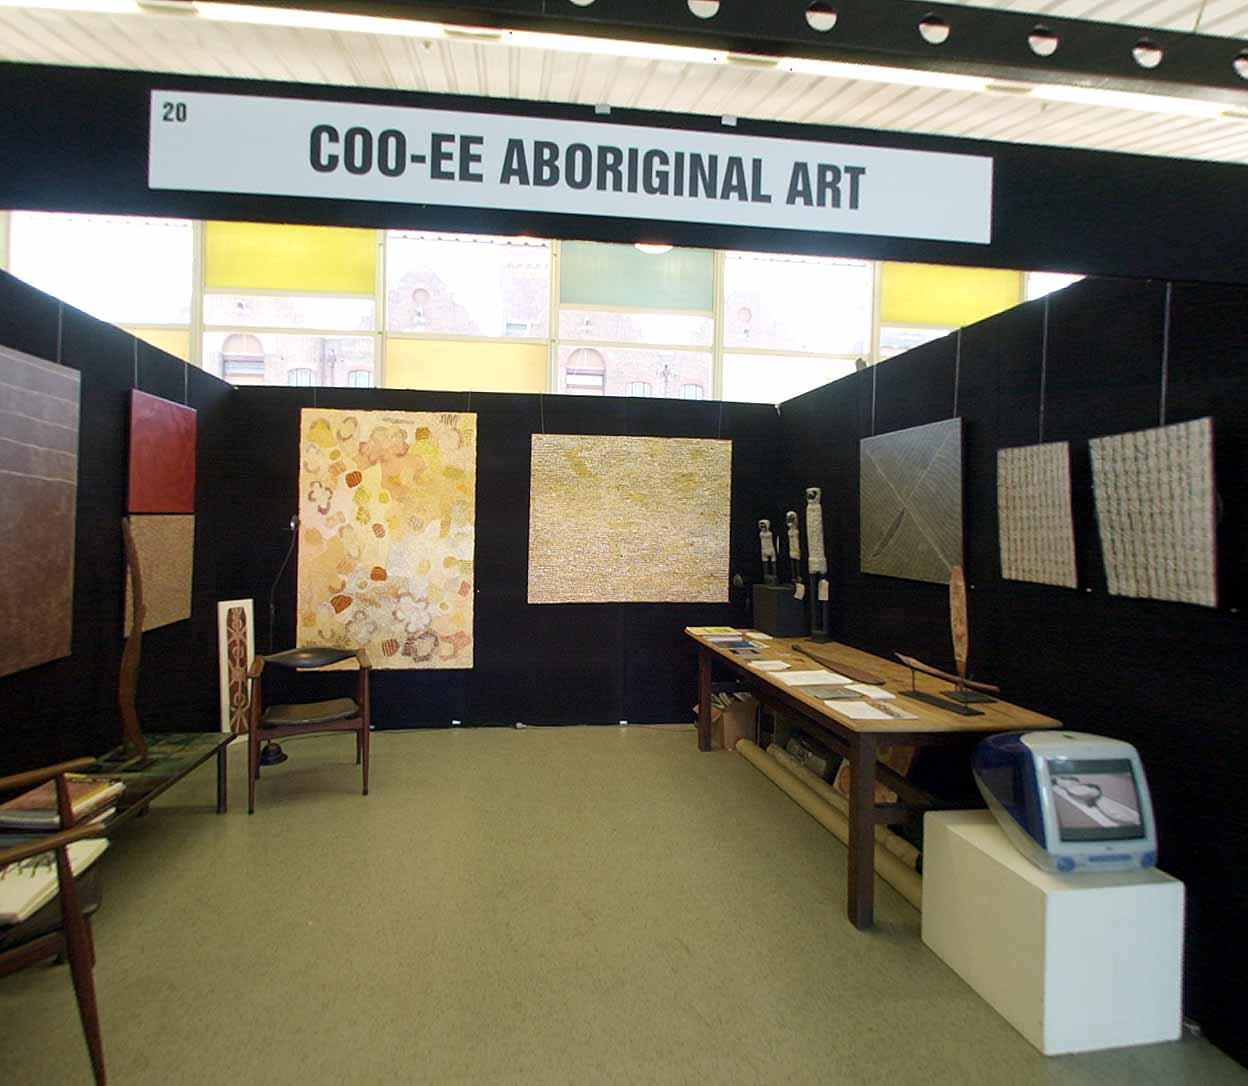 COO-EE Aboriginal Art. 22.jpg